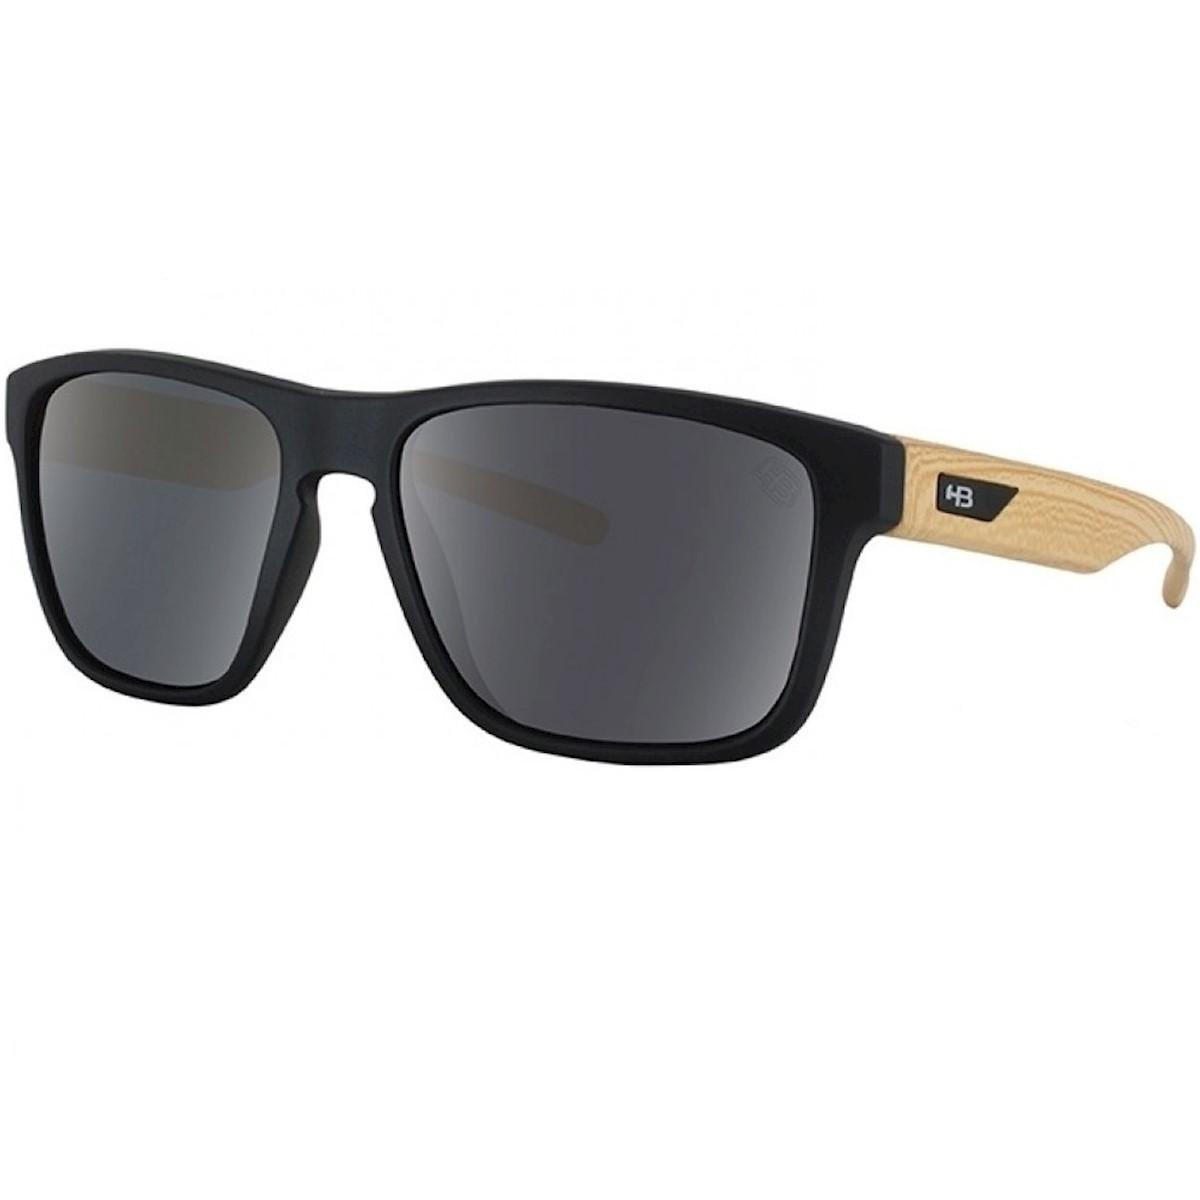 b64f0161d0d78 Óculos HB H-Bomb Matte Wood - Preto - Compre Agora   Zattini